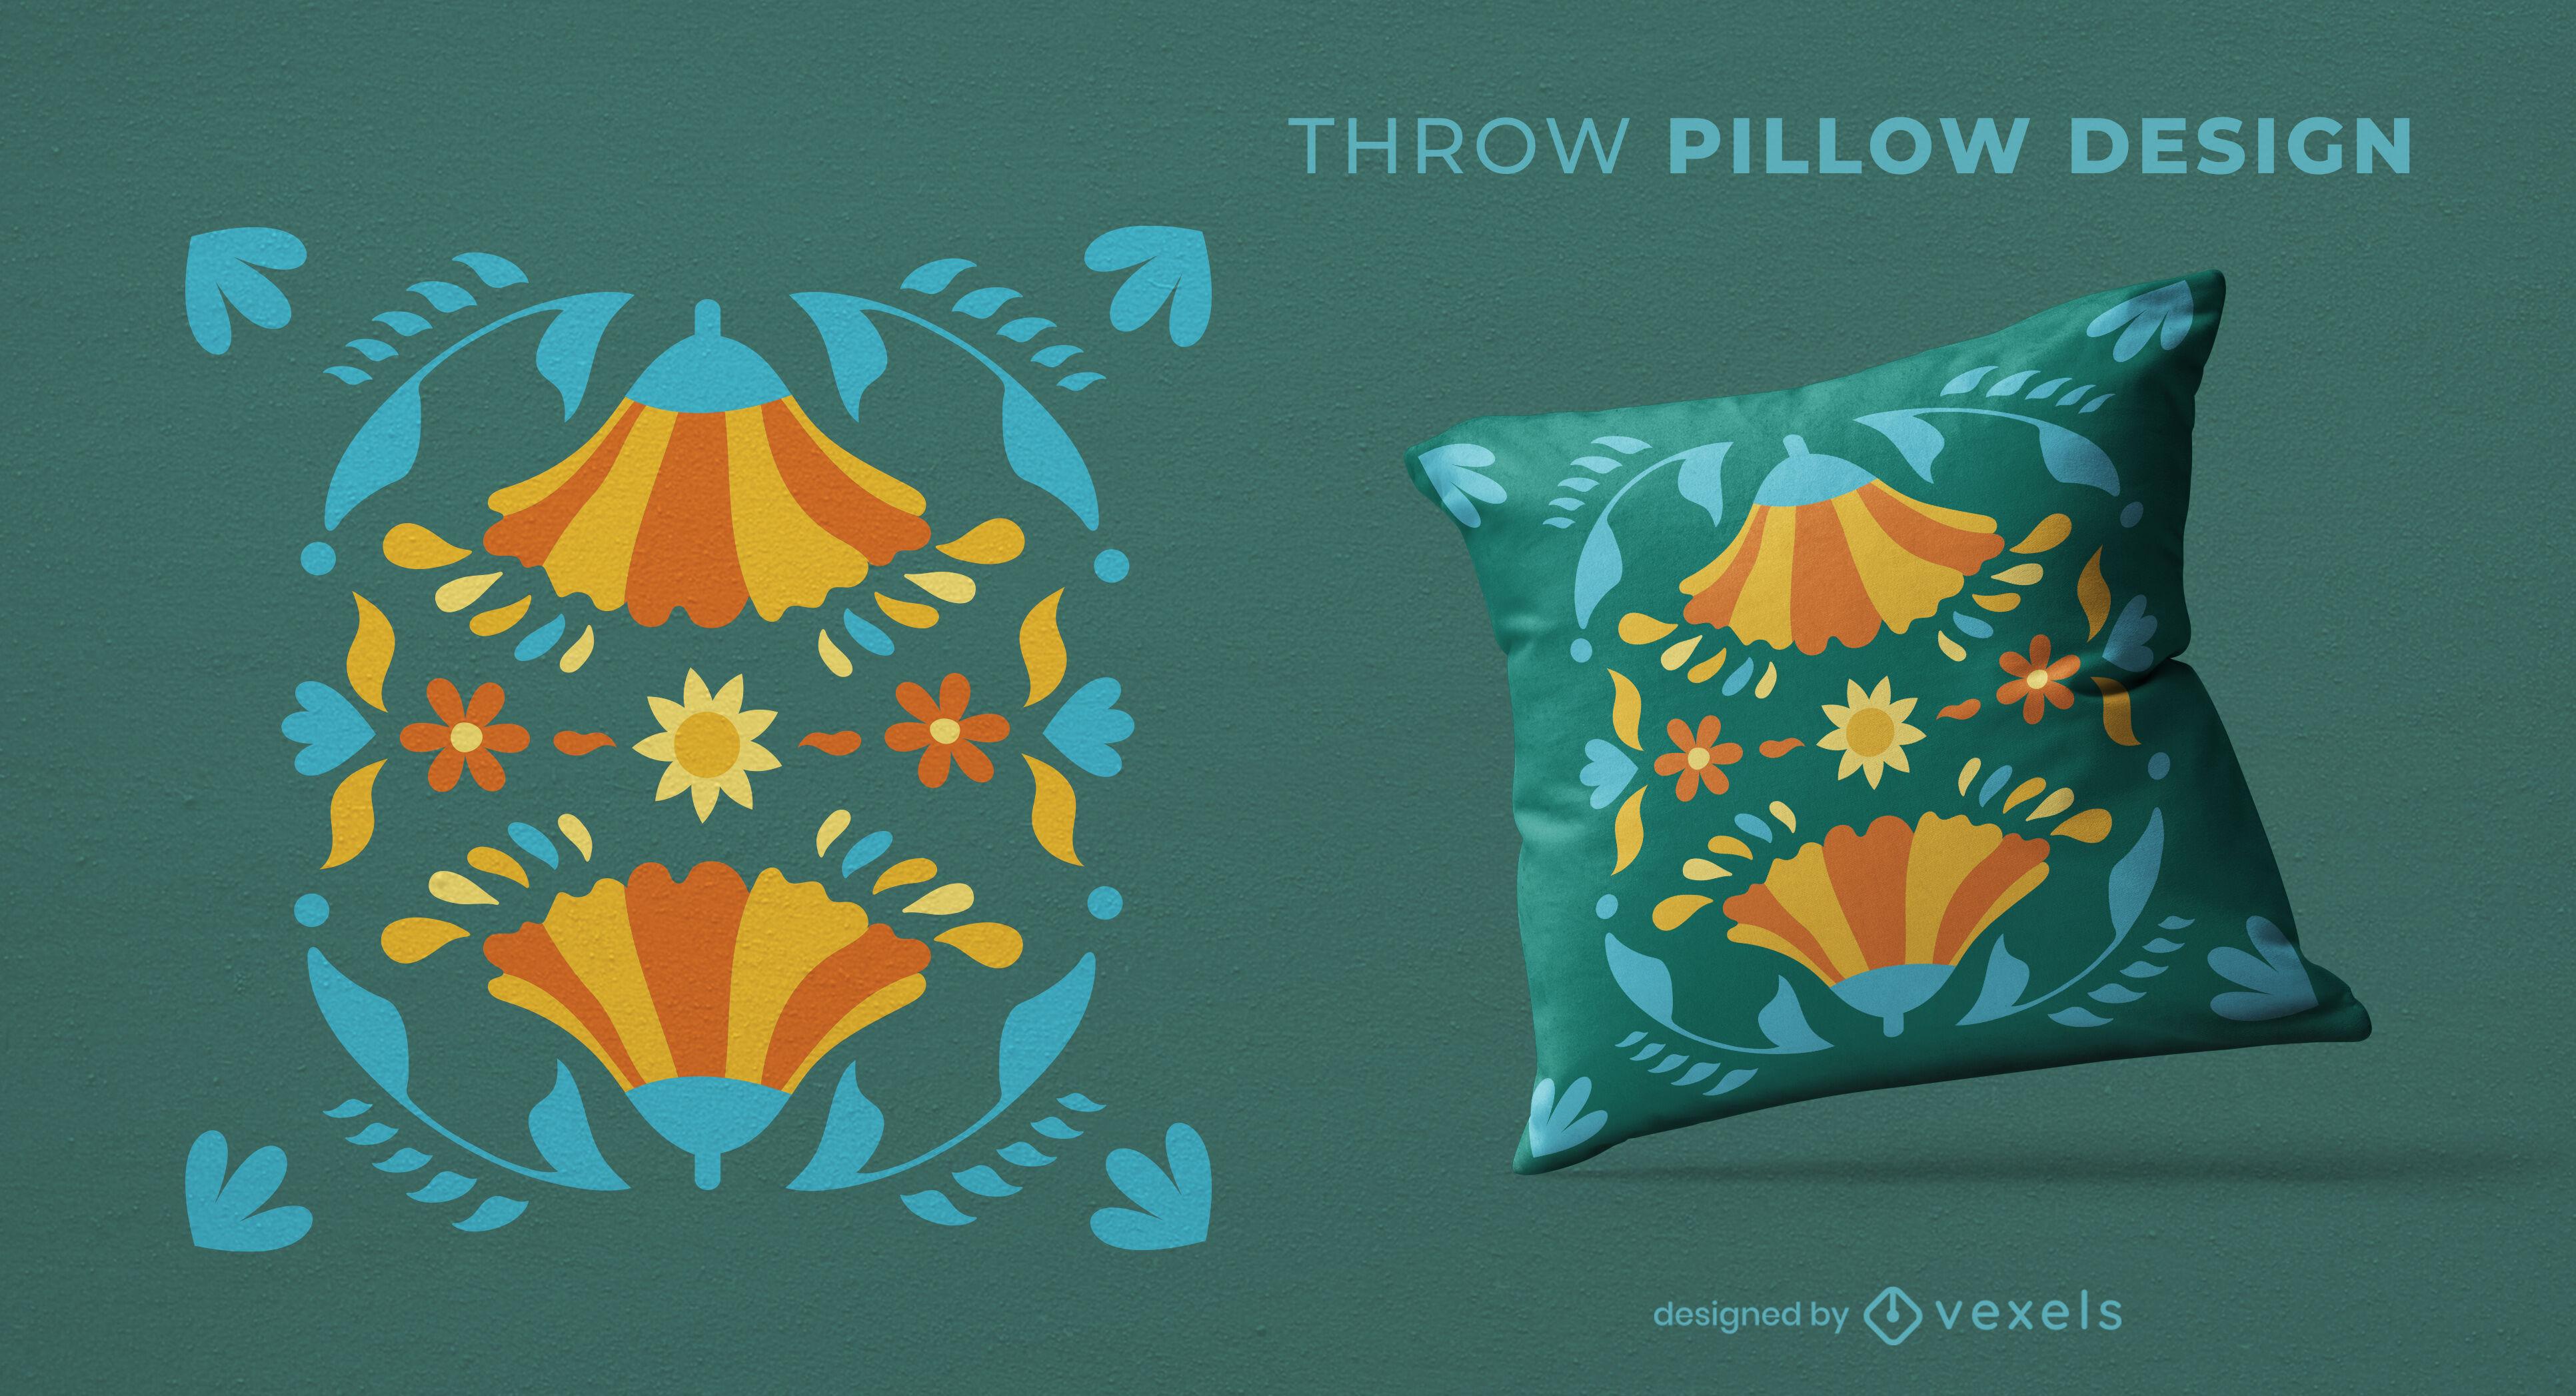 Mirrored flowers nature throw pillow design